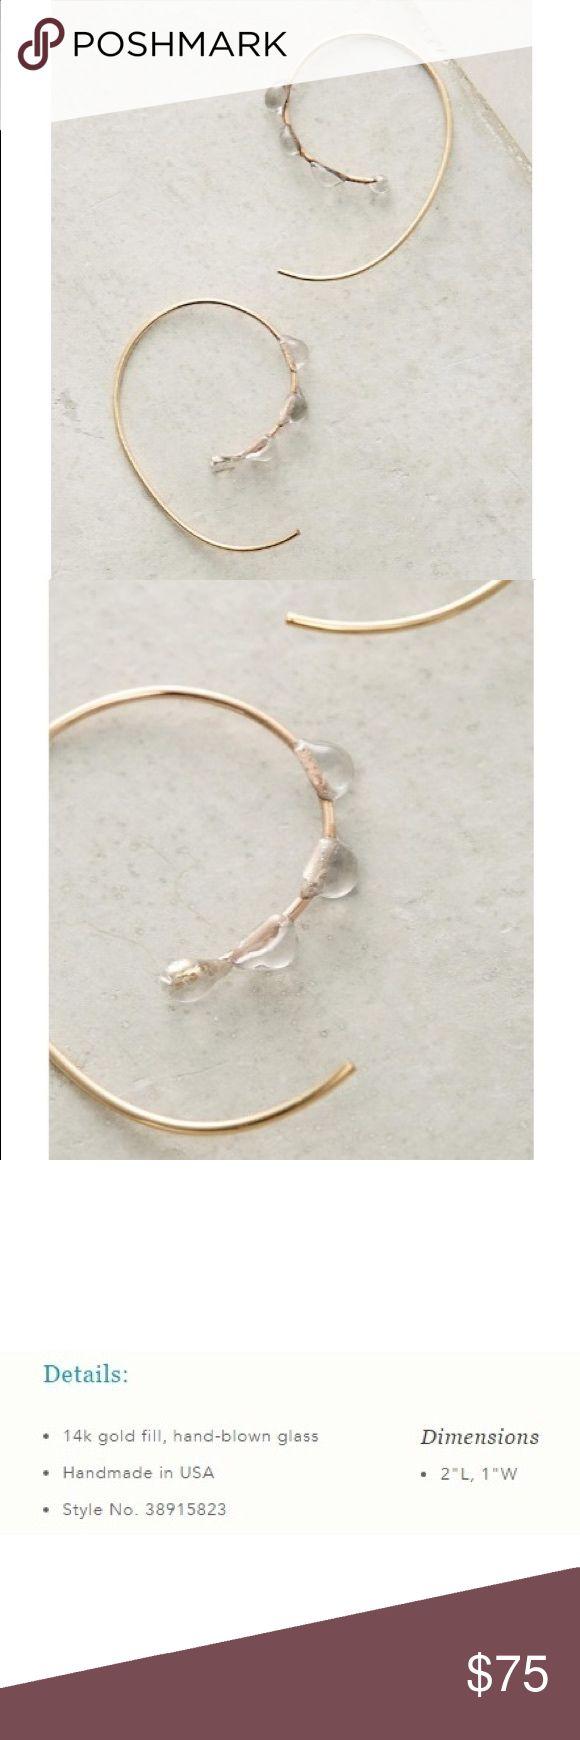 "Anthropologie Maelstrom Hoop Earrings NWT. Anthropologie Maelstrom Hoop earrings by Jess Panza.   Details:  💗14 karat gold fill, hand blown glass  💗handmade in USA  💗Style No. 38915823 💗2""L, 1""W Anthropologie Jewelry Earrings"